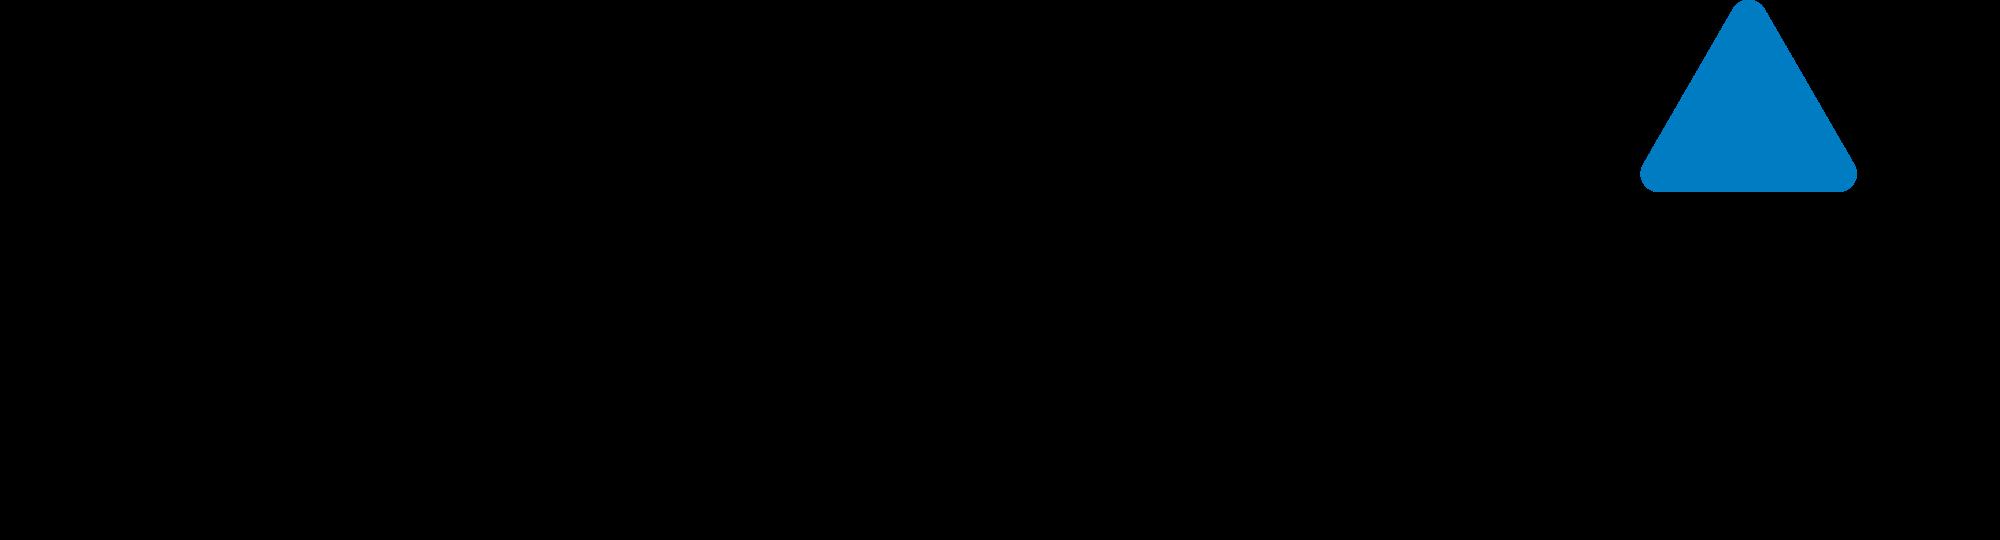 2000px-Garmin_logo.svg